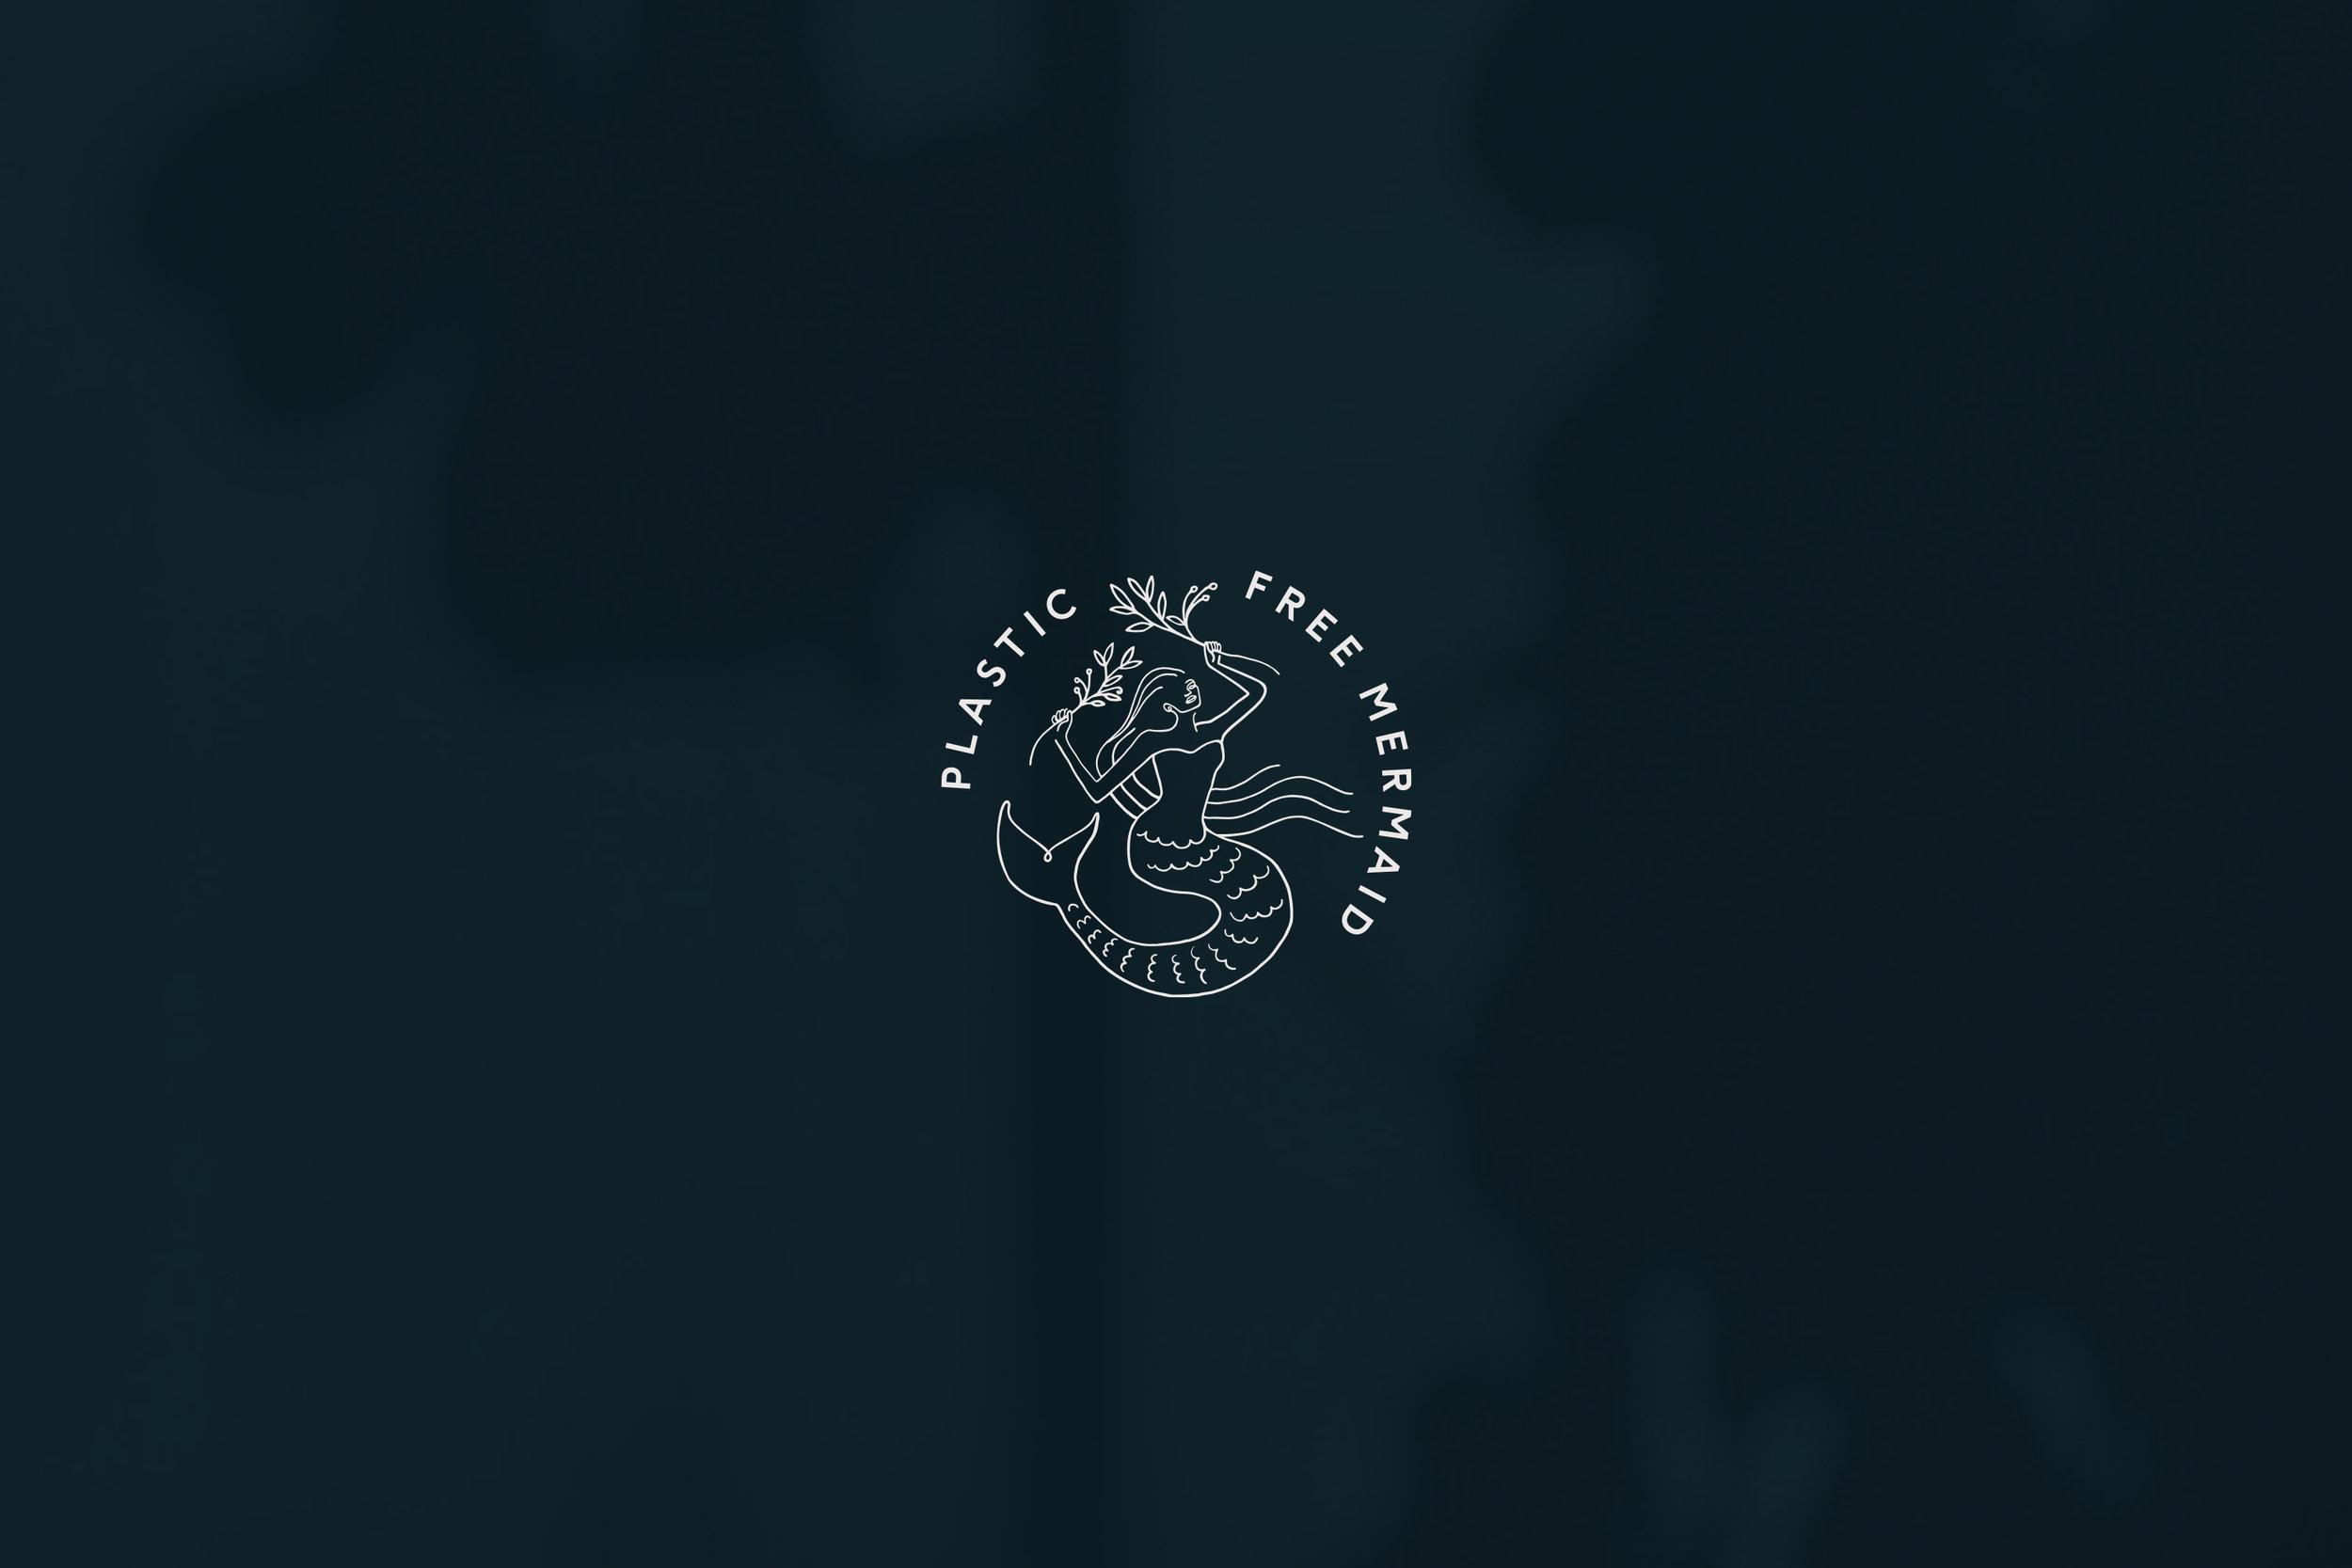 PFM_Folio_Logo.jpg